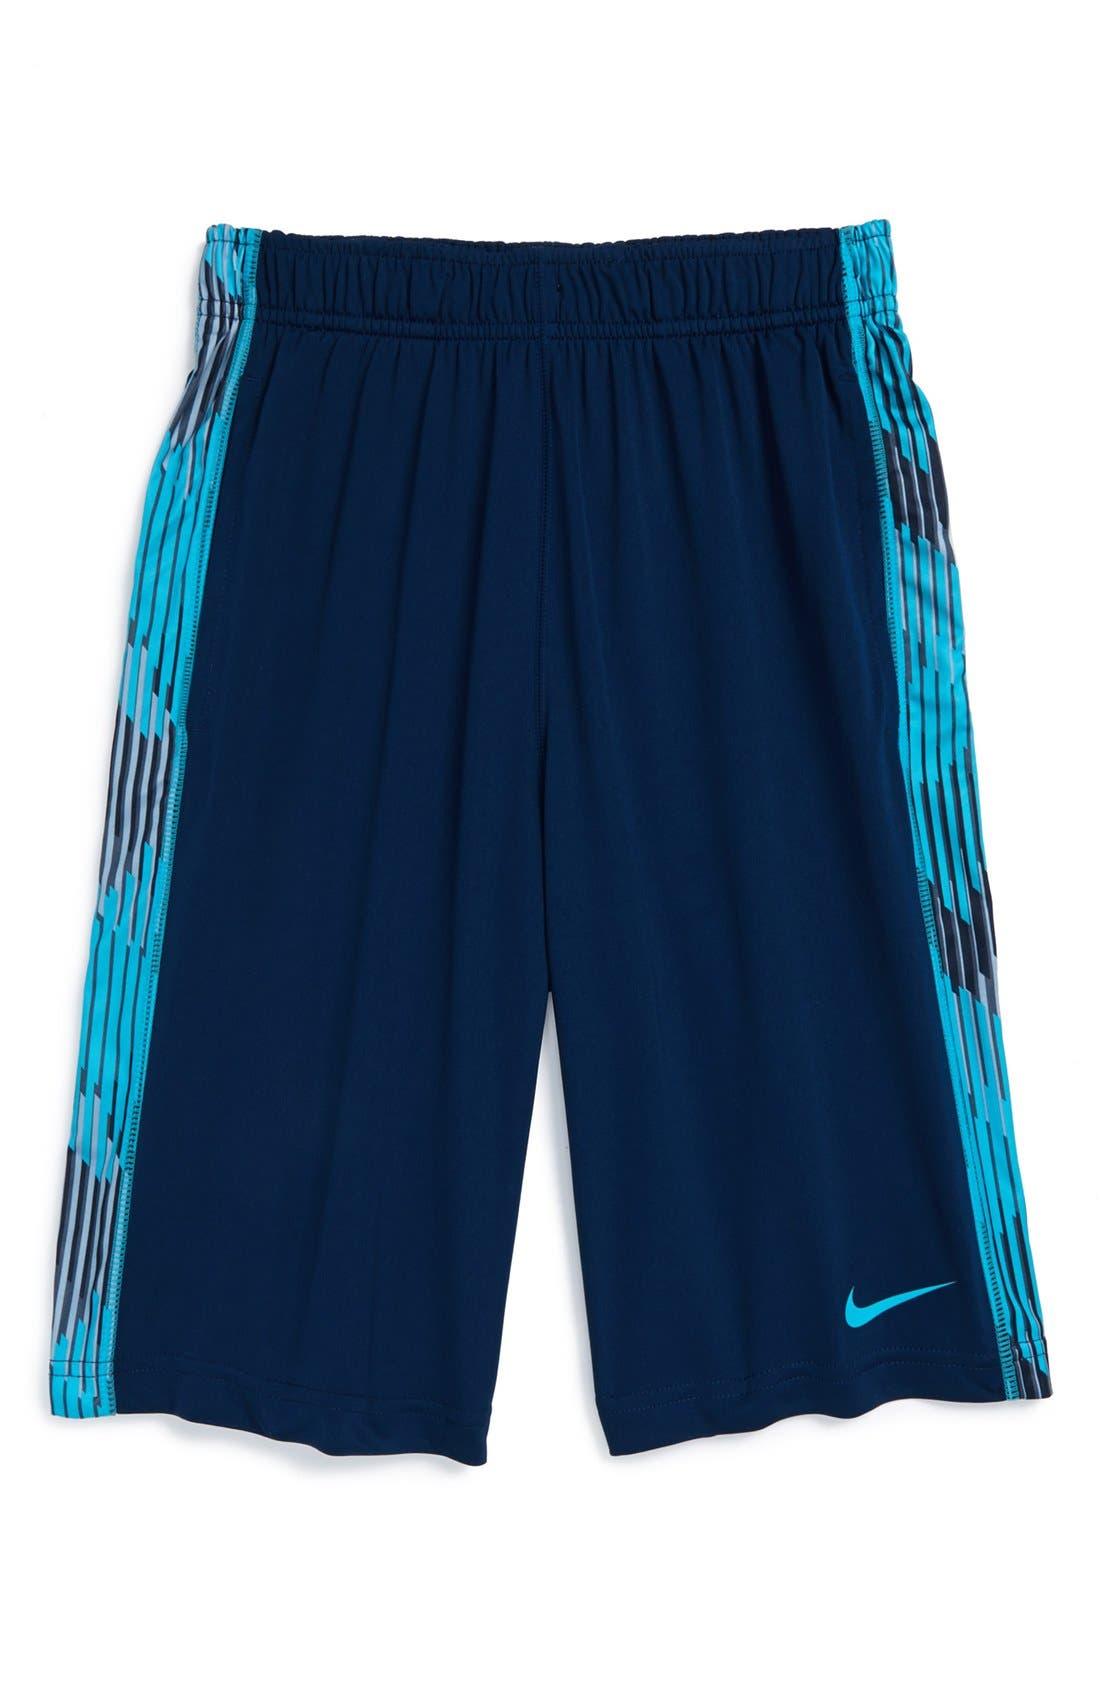 Alternate Image 1 Selected - Nike 'Fly GFX' Shorts (Big Boys)